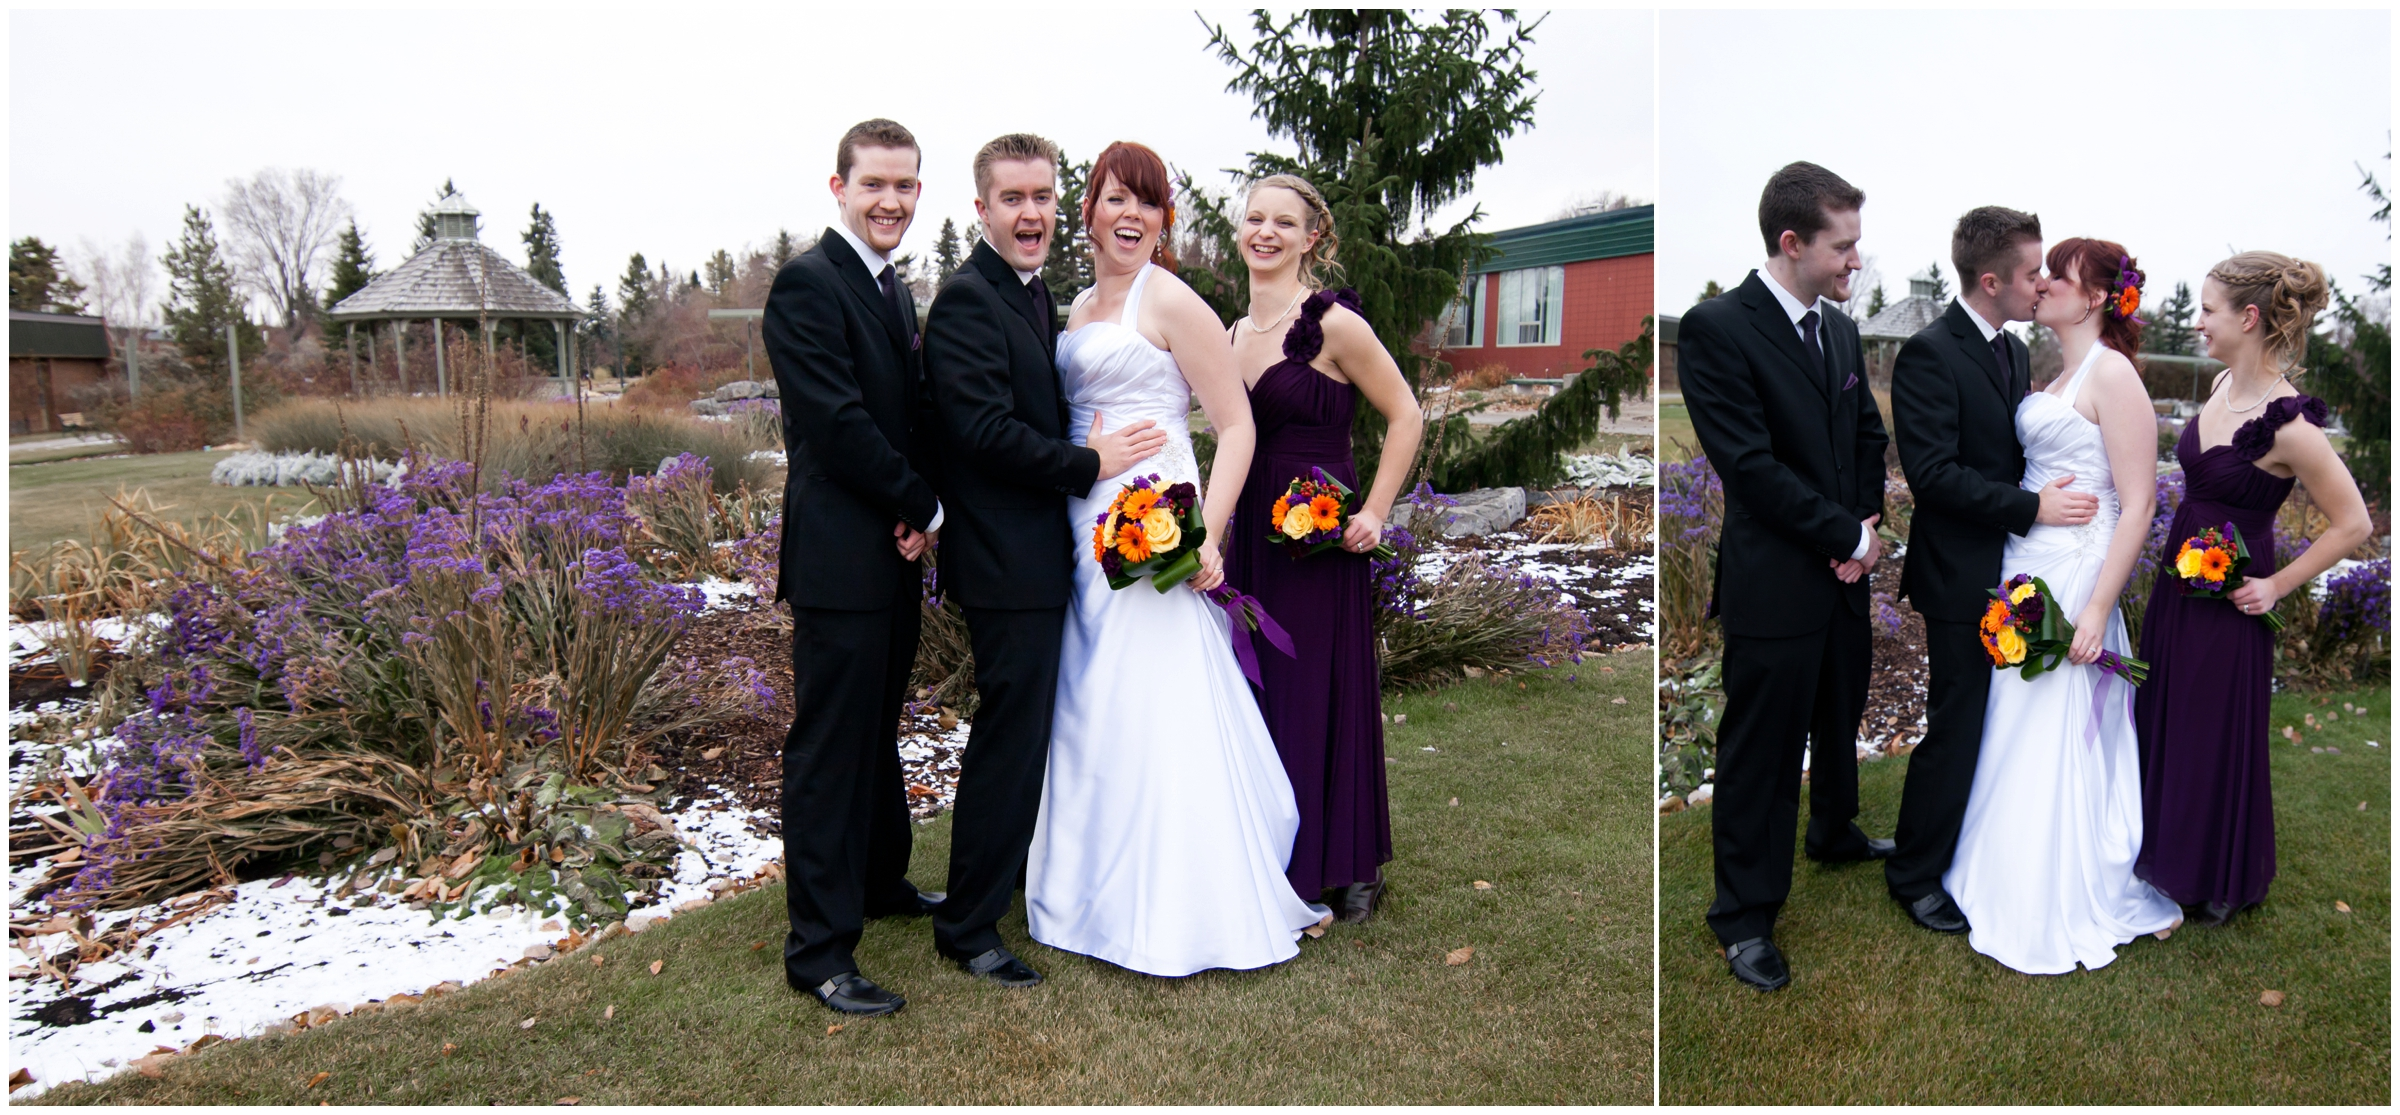 Bree and Tyler Wedding_0012.jpg